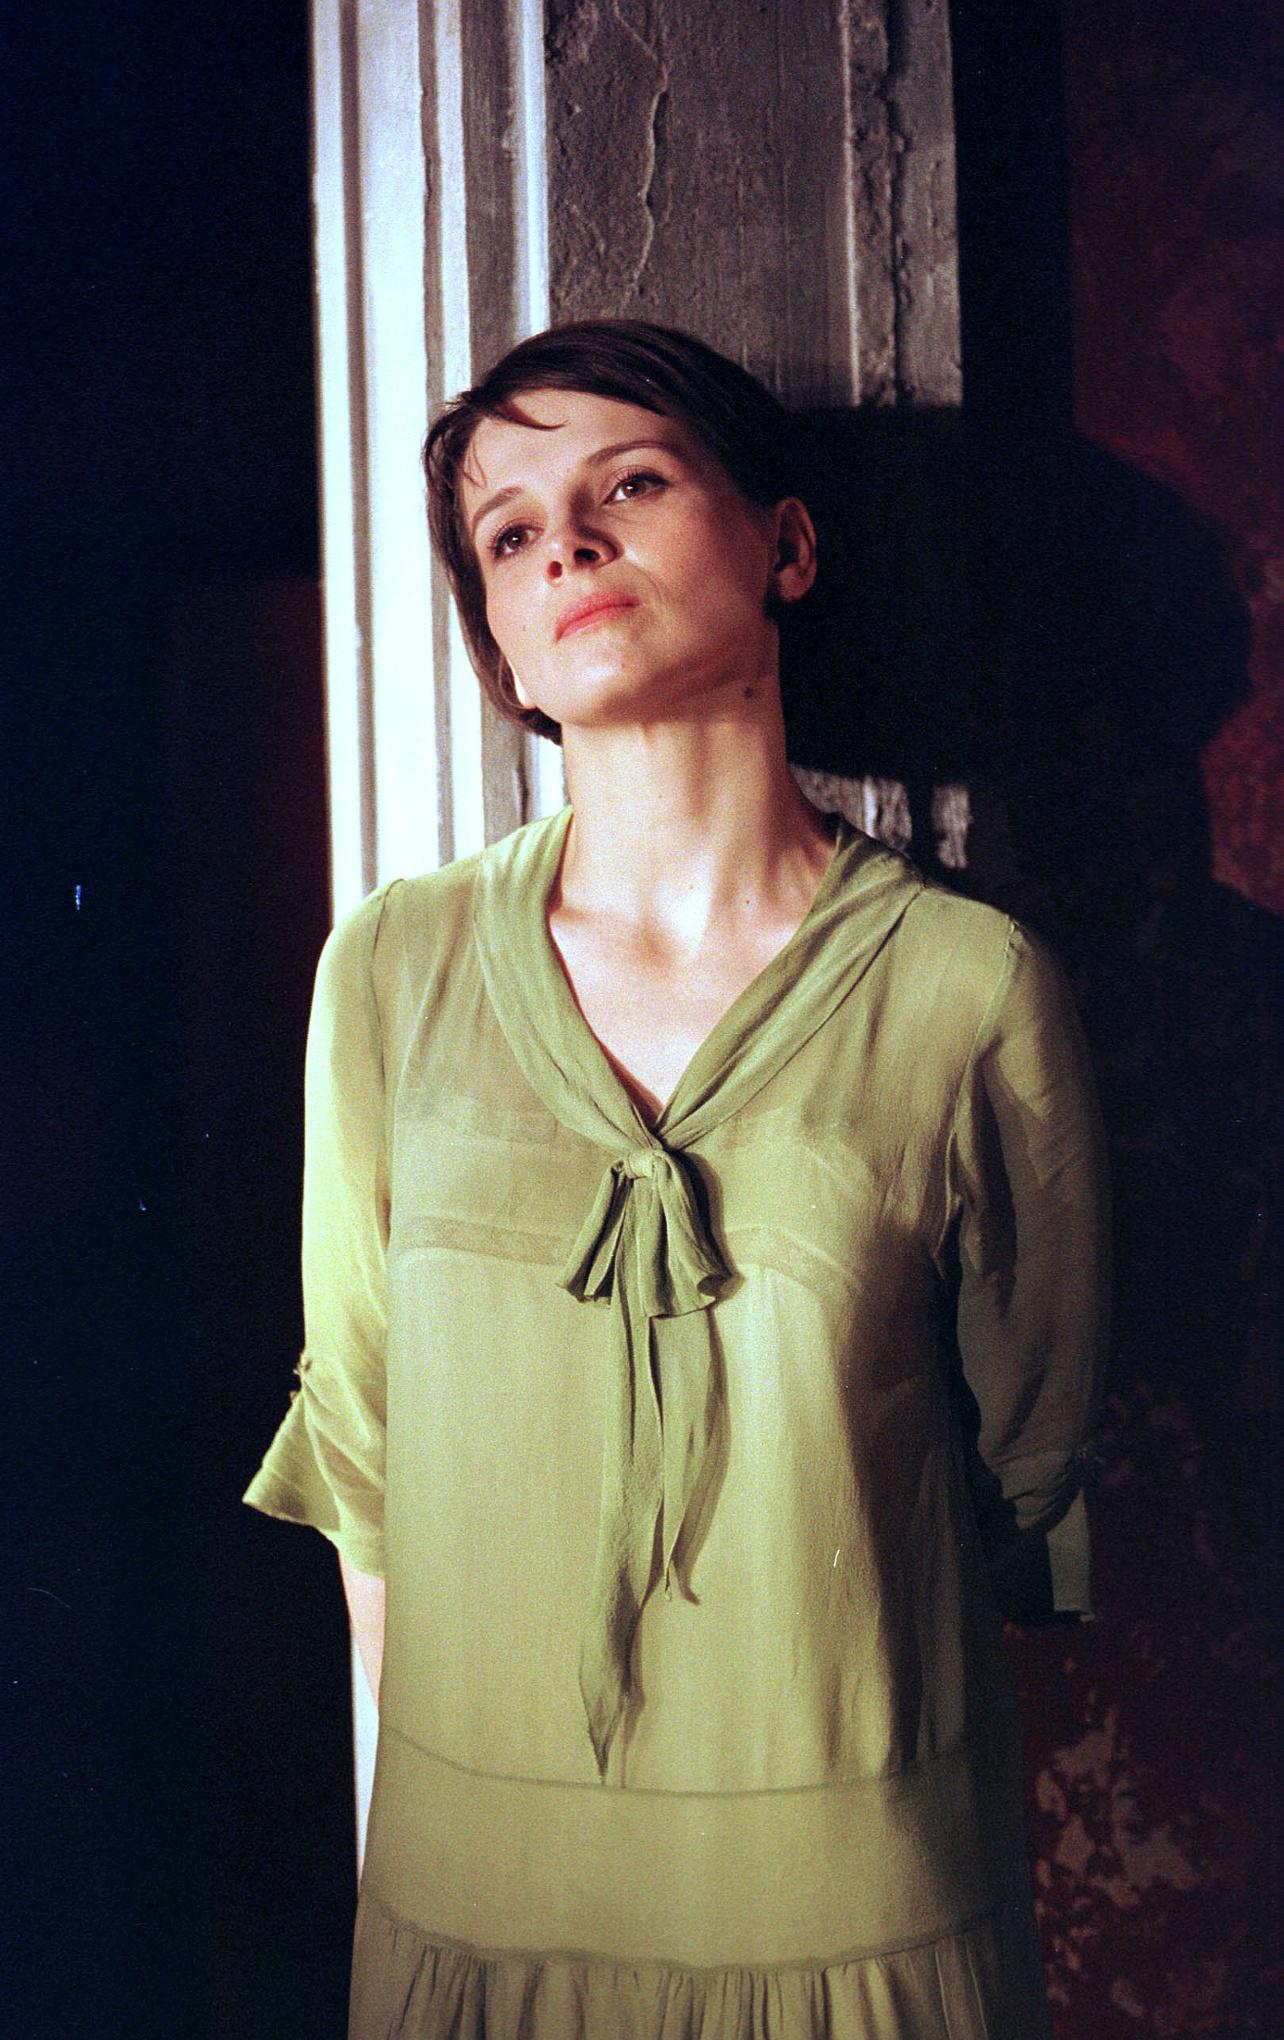 From Naked to Antigone: Juliette Binoche on stage - in